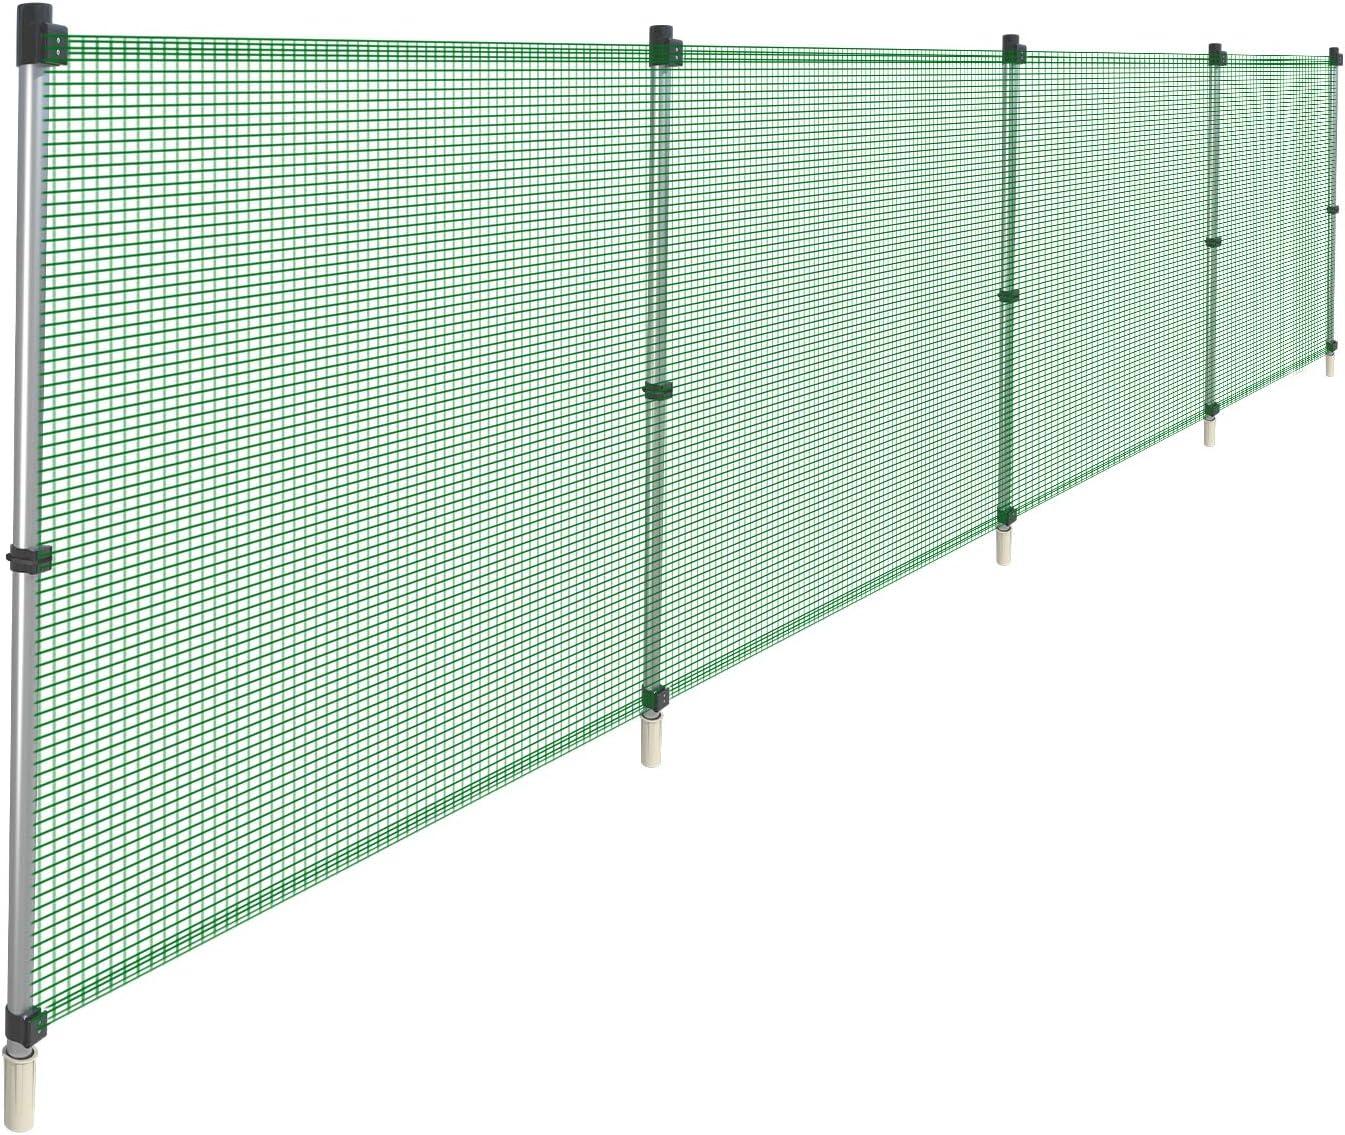 COARBOR Outdoor Fencing with Metal Poles Fence Removable Max 44% Max 72% OFF OFF Reusabl